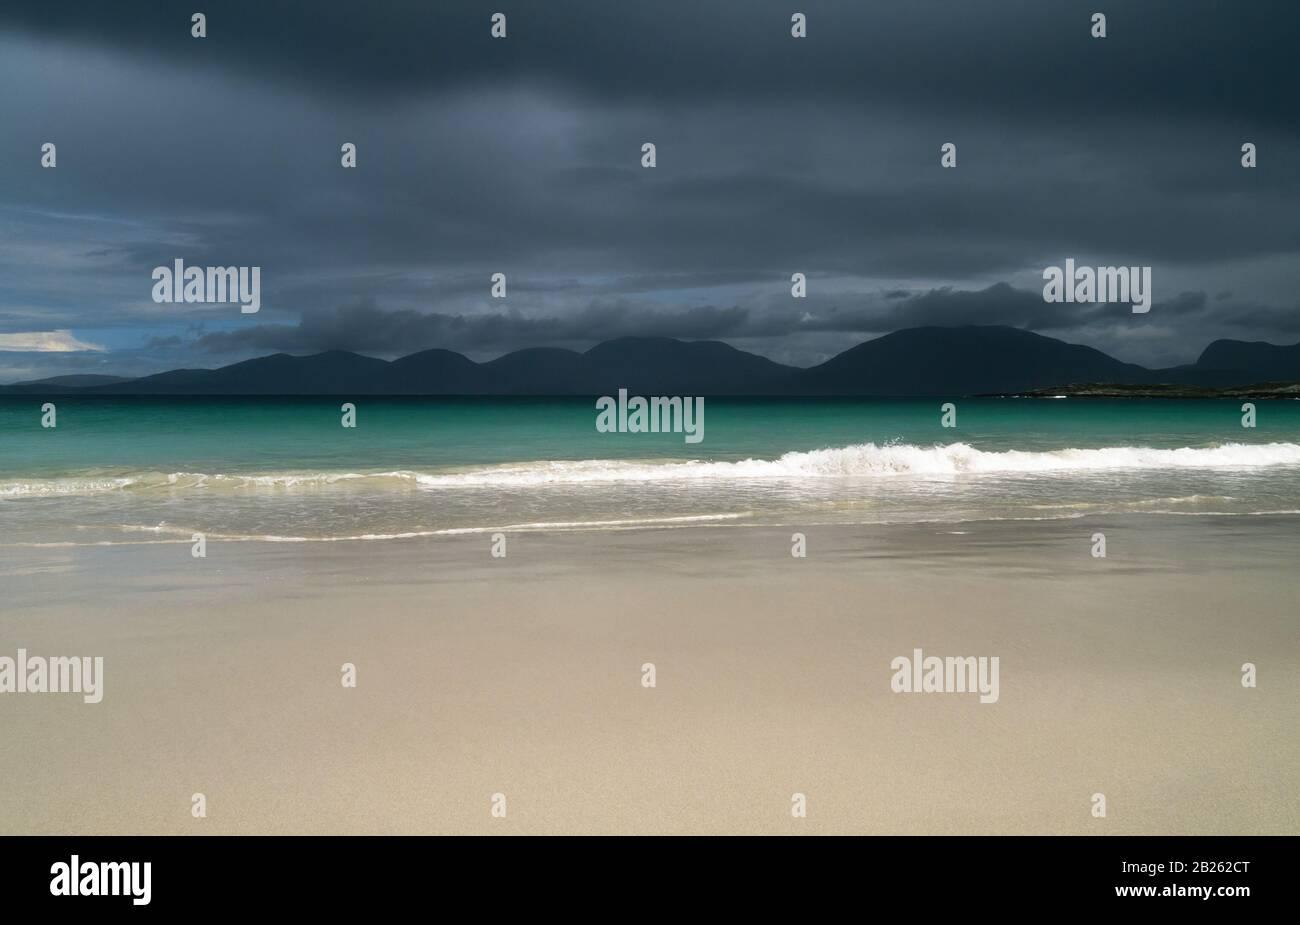 Dark cloudy skies over the smooth sands of Luskentyre Beach (Traigh Rosamol), Isle of Harris, Scotland, UK Stock Photo